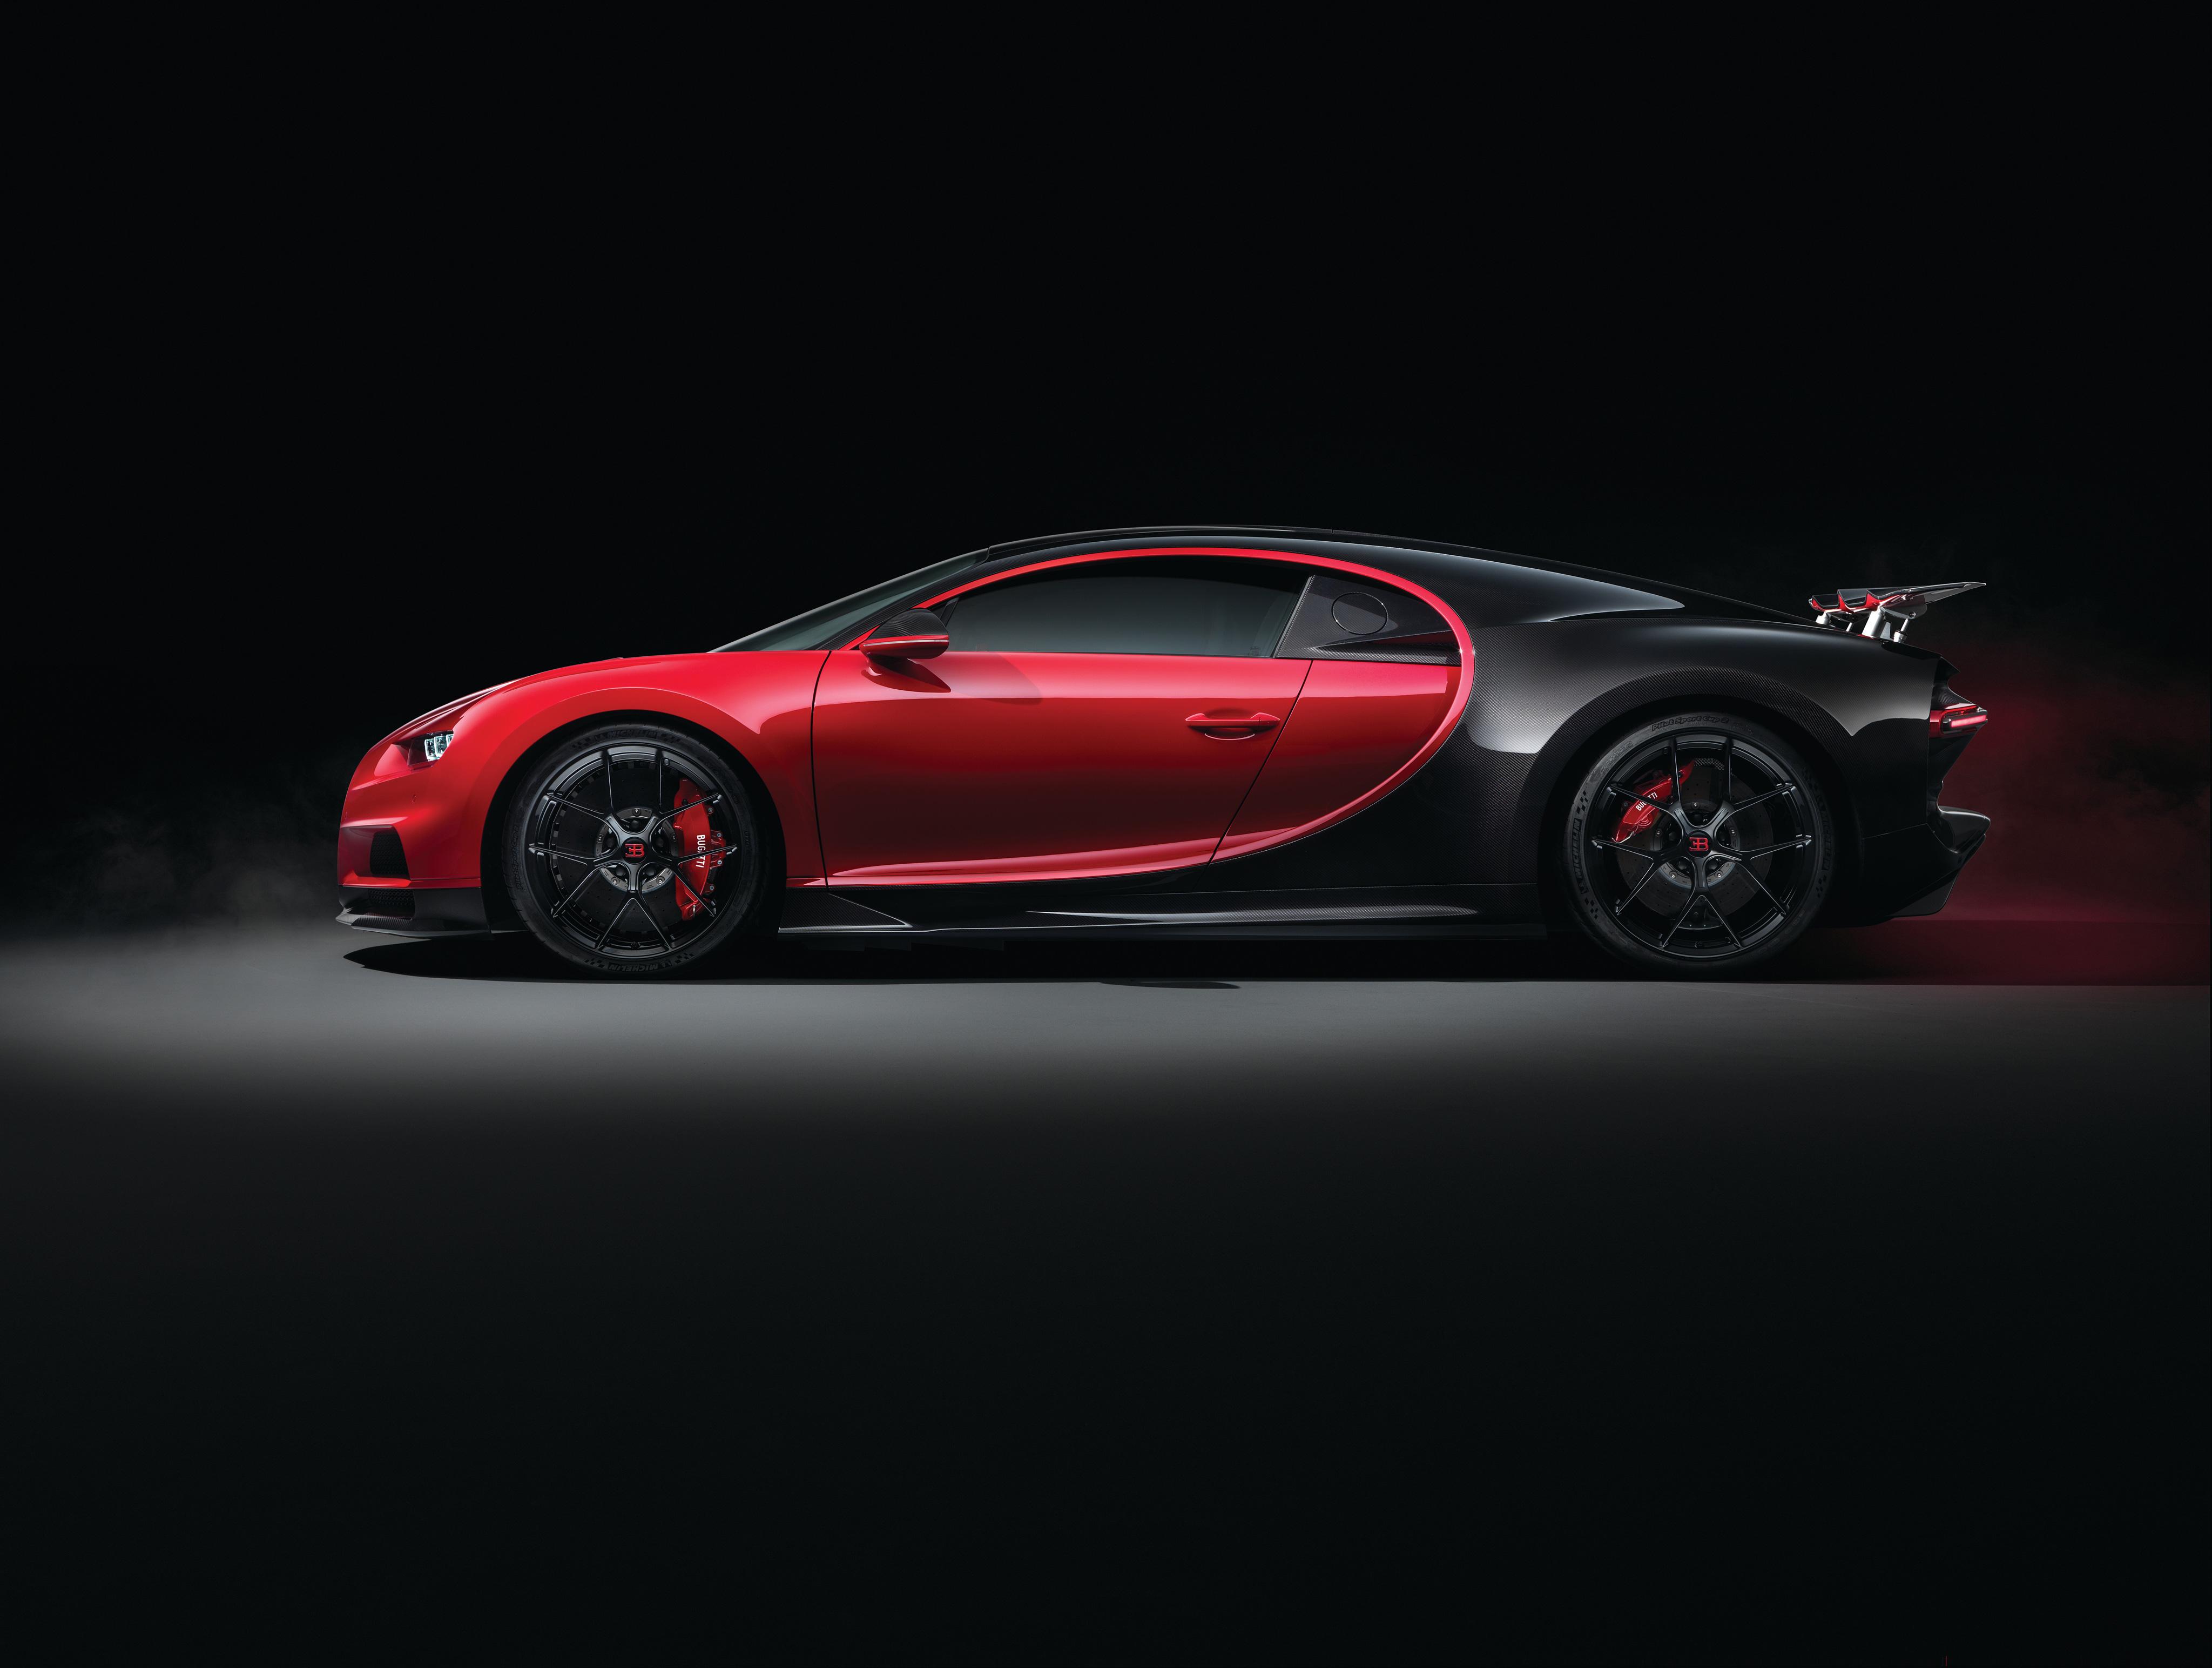 Bugatti Chiron Side View 4k, HD Cars, 4k Wallpapers ...